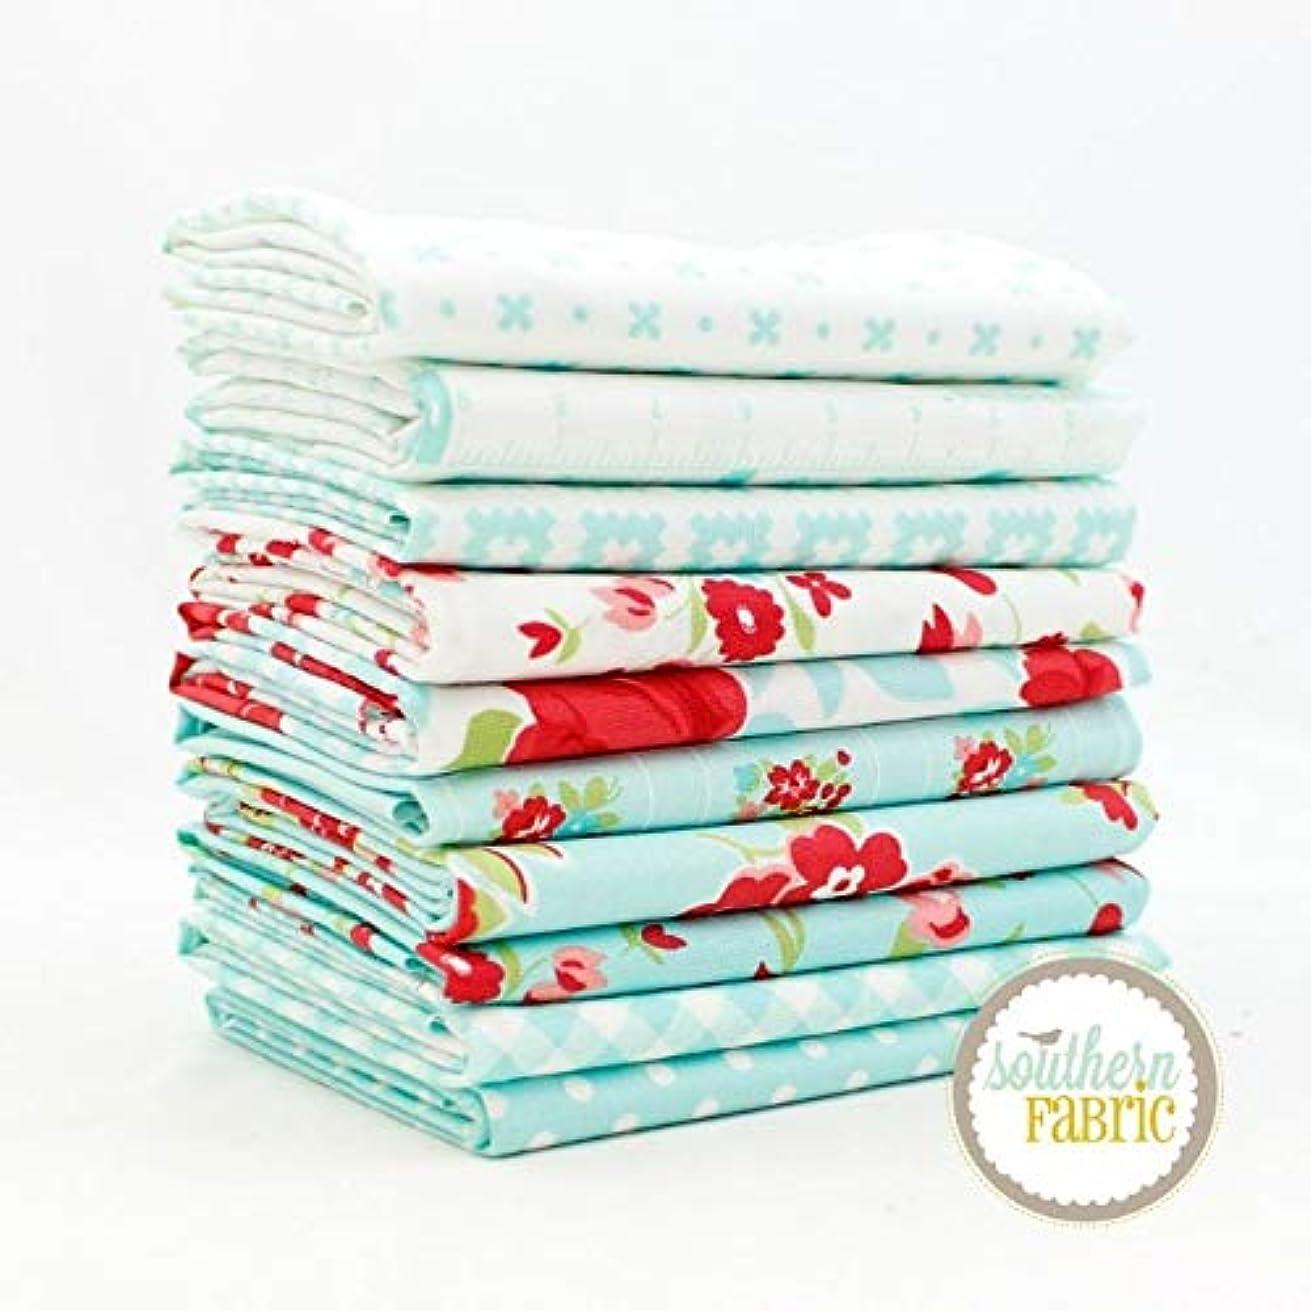 United Notions Little Snippets - Aqua Fat Quarter Bundle (10 pcs) by Bonnie and Camille 18 x 21 inches (45.72cm x 53.34cm) Fabric cuts DIY Quilt Fabric